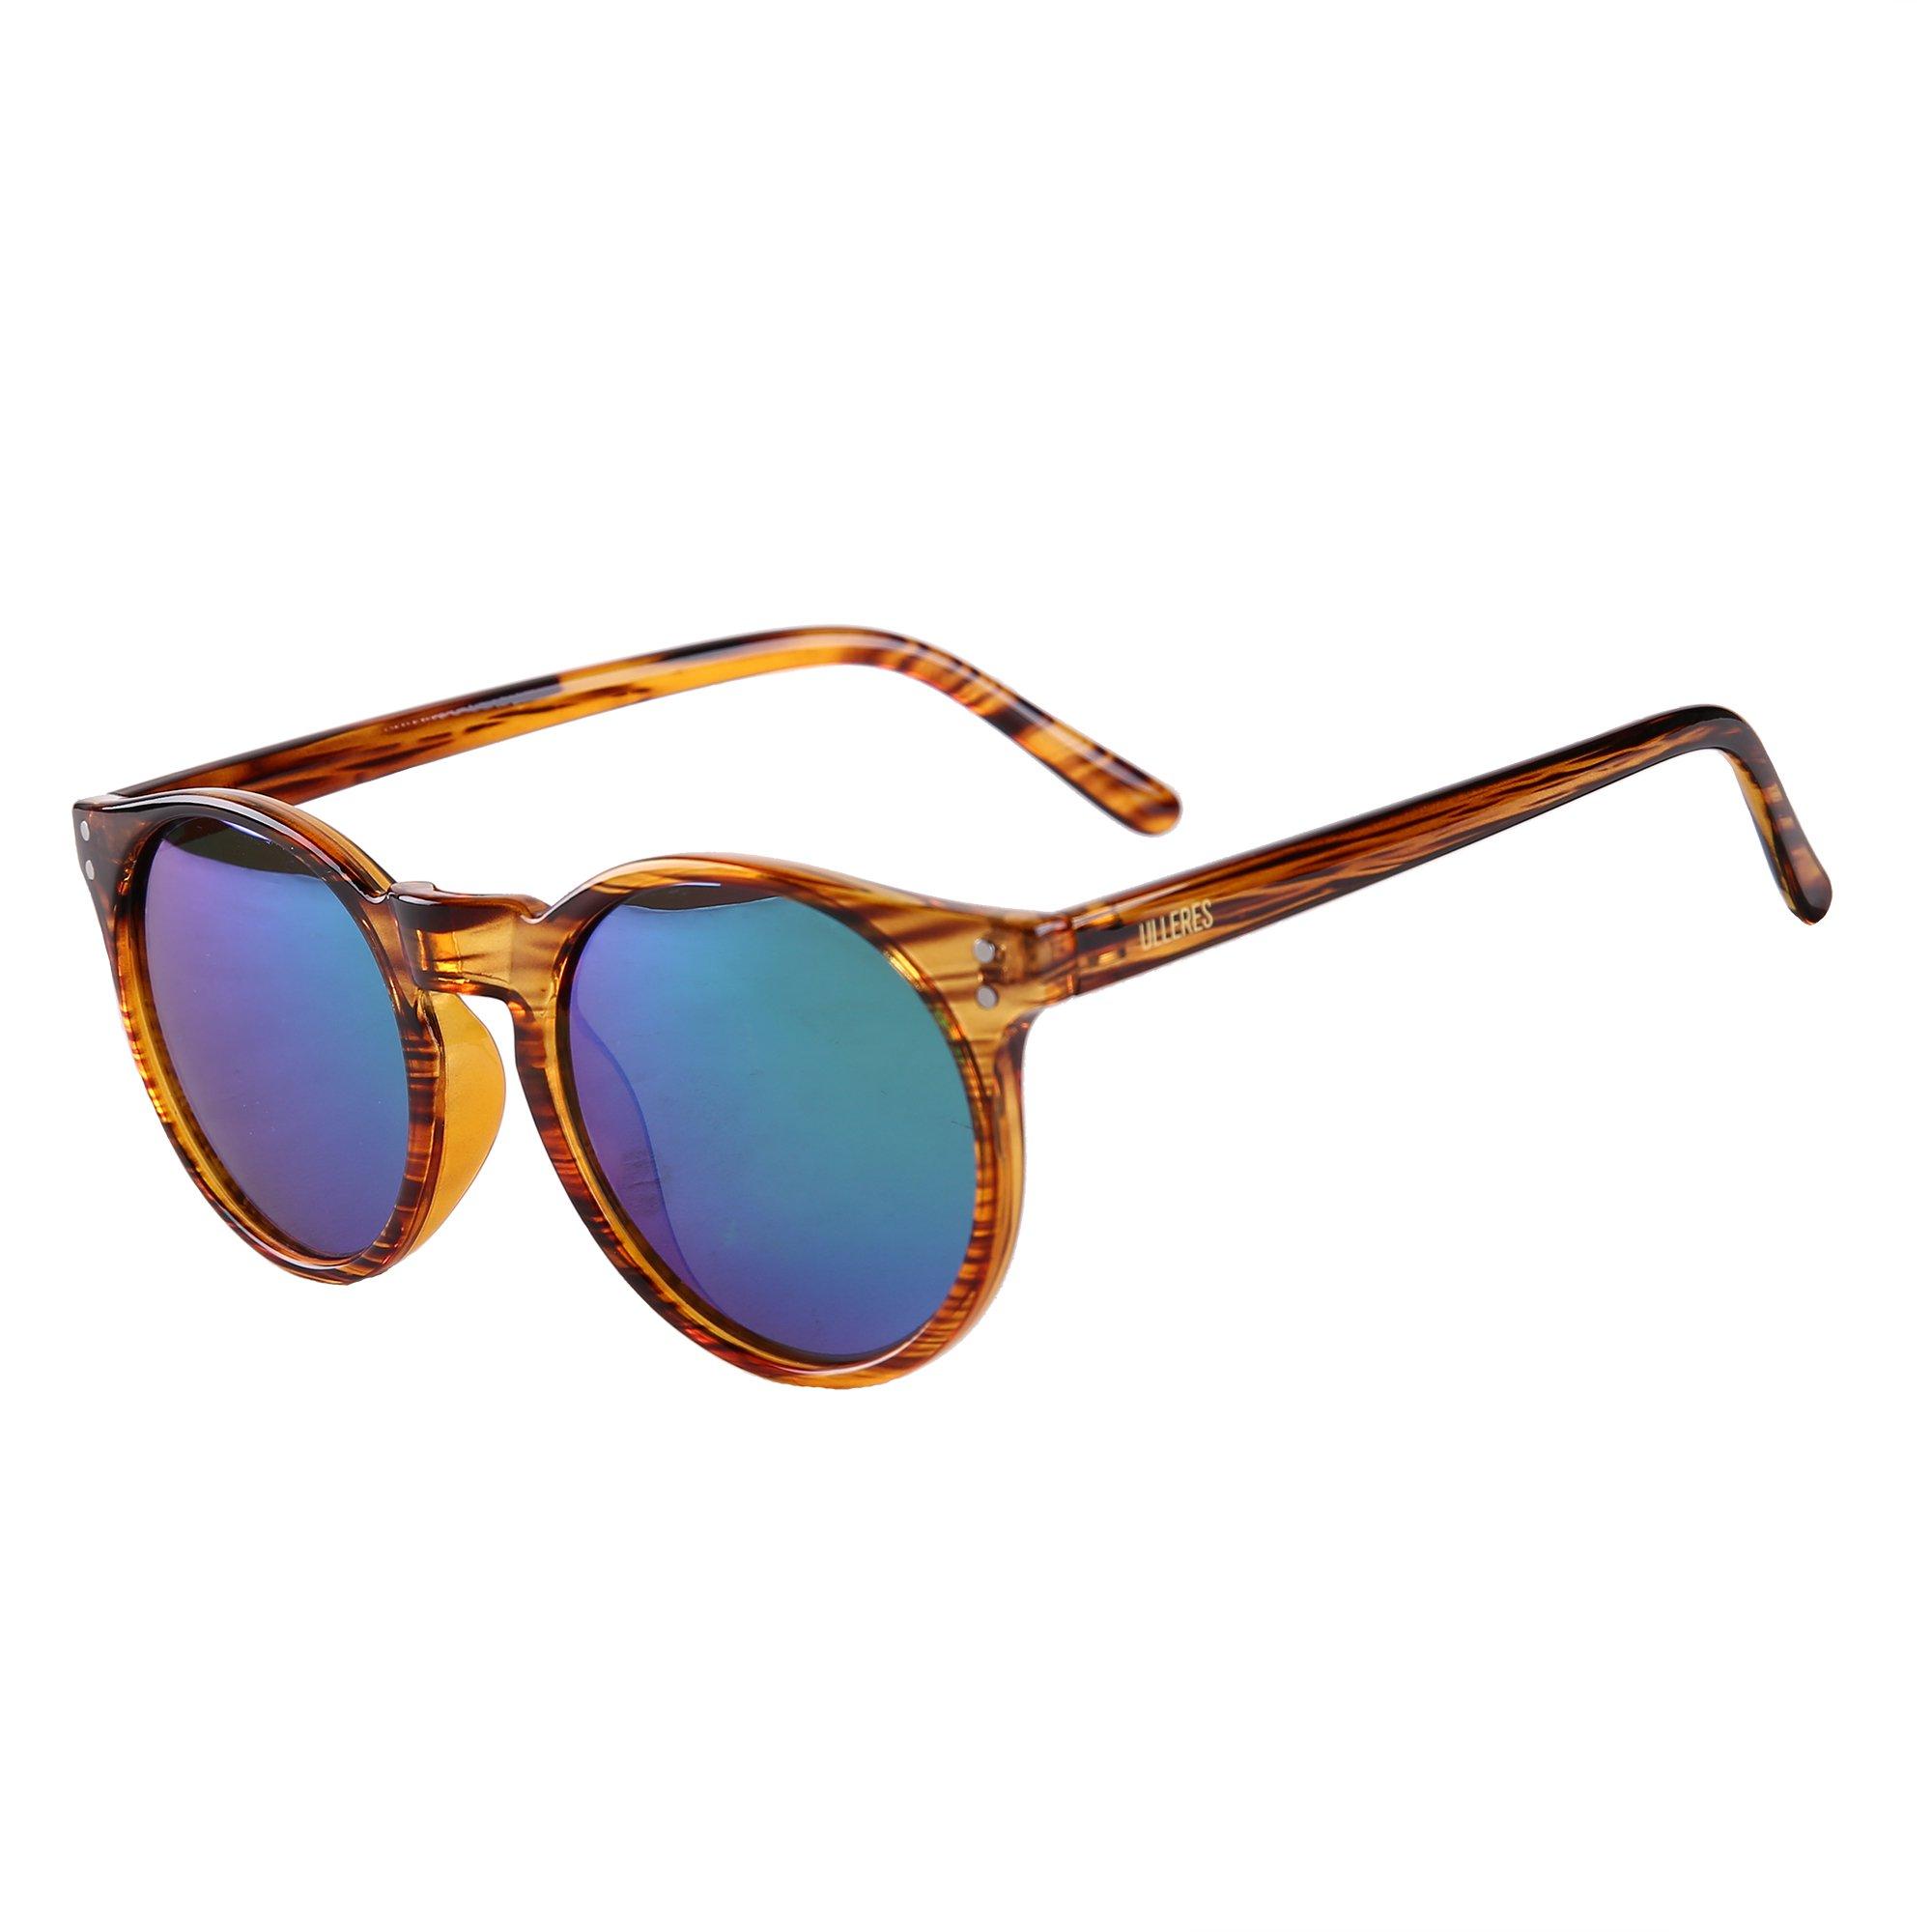 ULLERES Unisex UV Protection Polarized Sunglasses (Strip DEMI, 49)